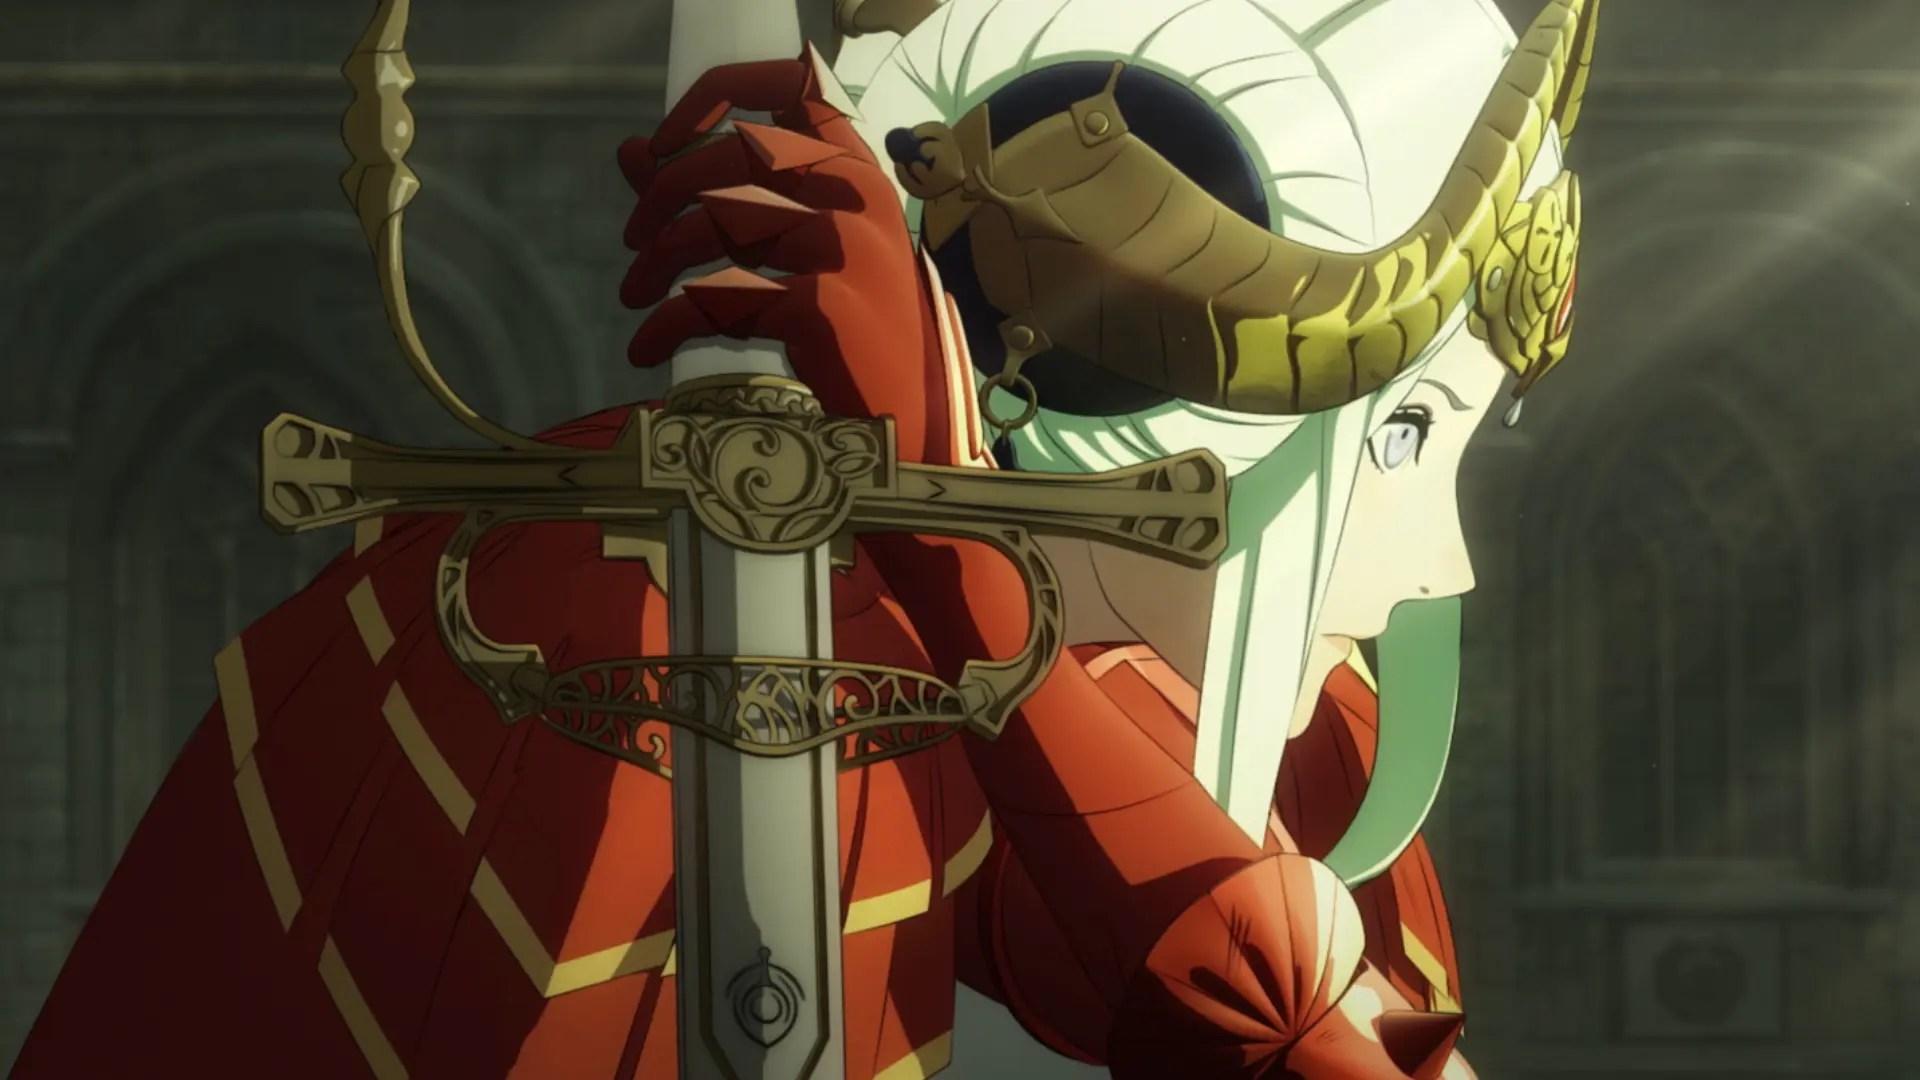 Fire Emblem: Three Houses E3 2019 Screenshot 2